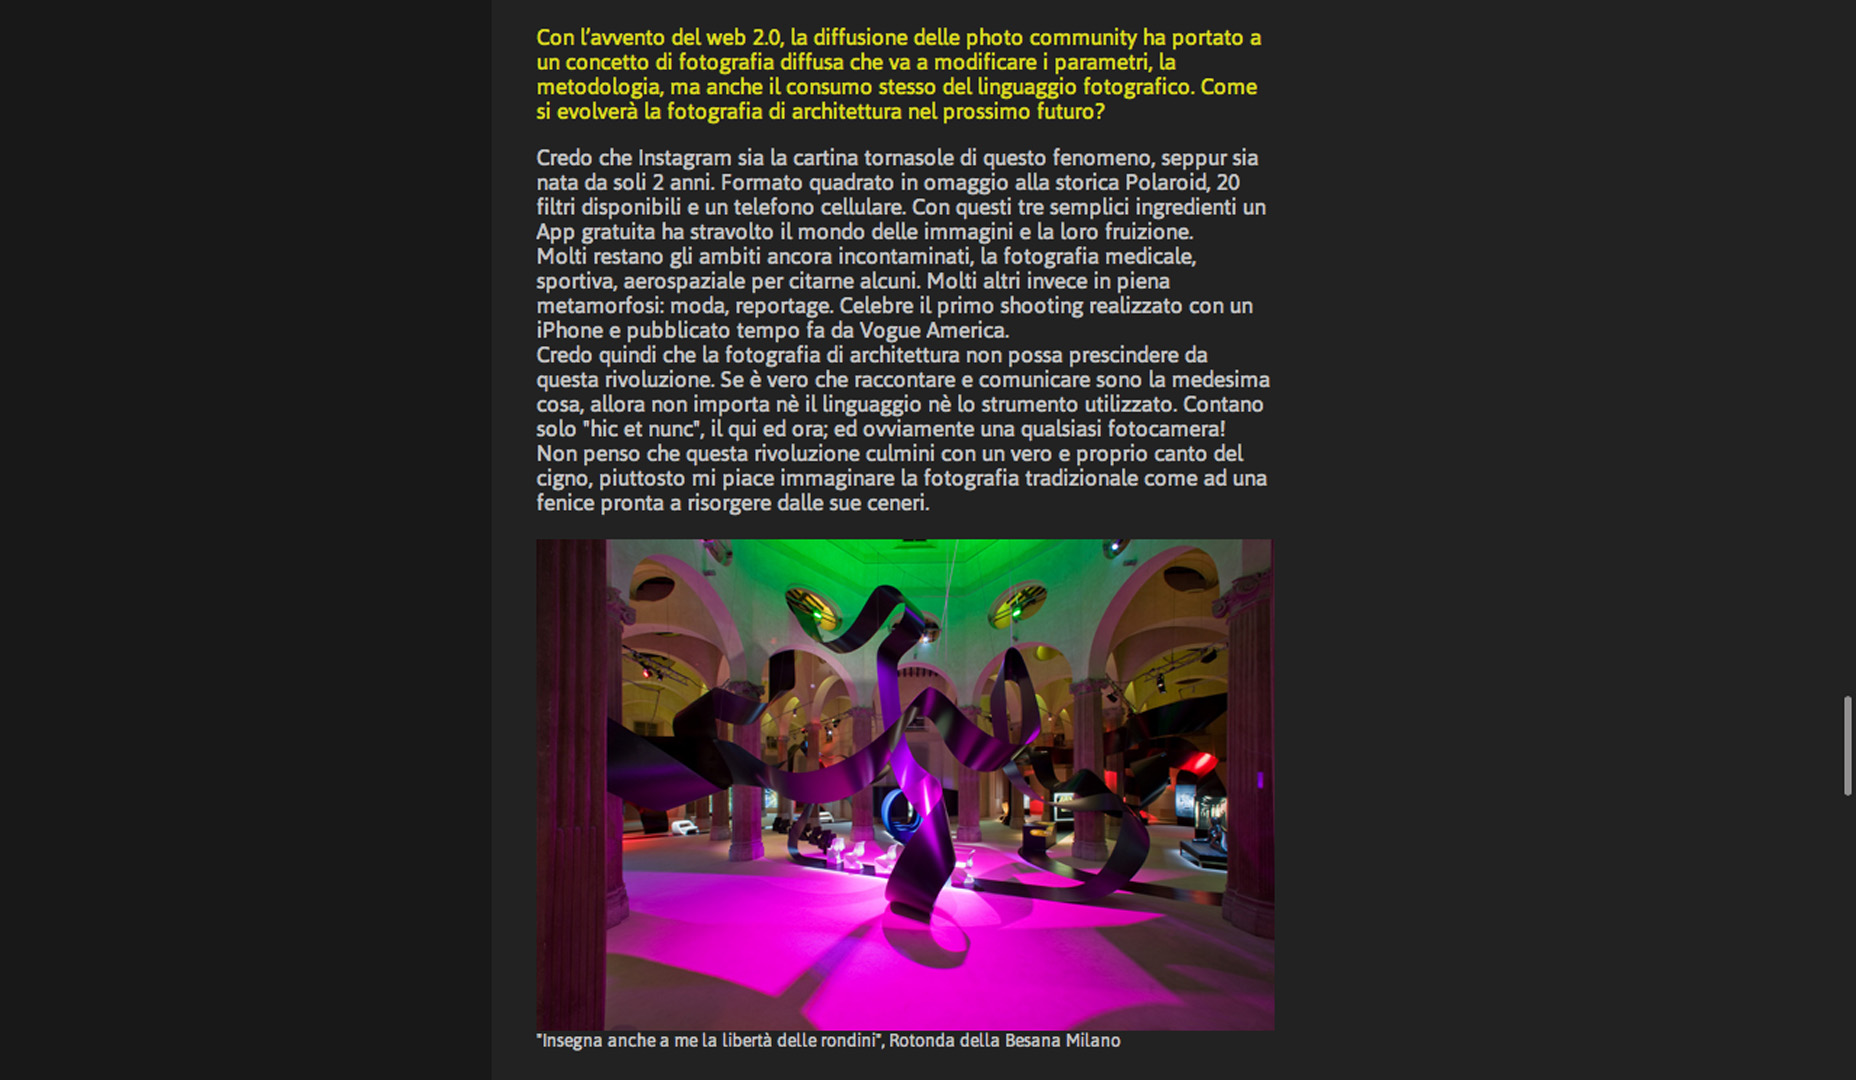 https://www.pasqualeformisano.com/wp-content/uploads/2016/11/blink_06.jpg